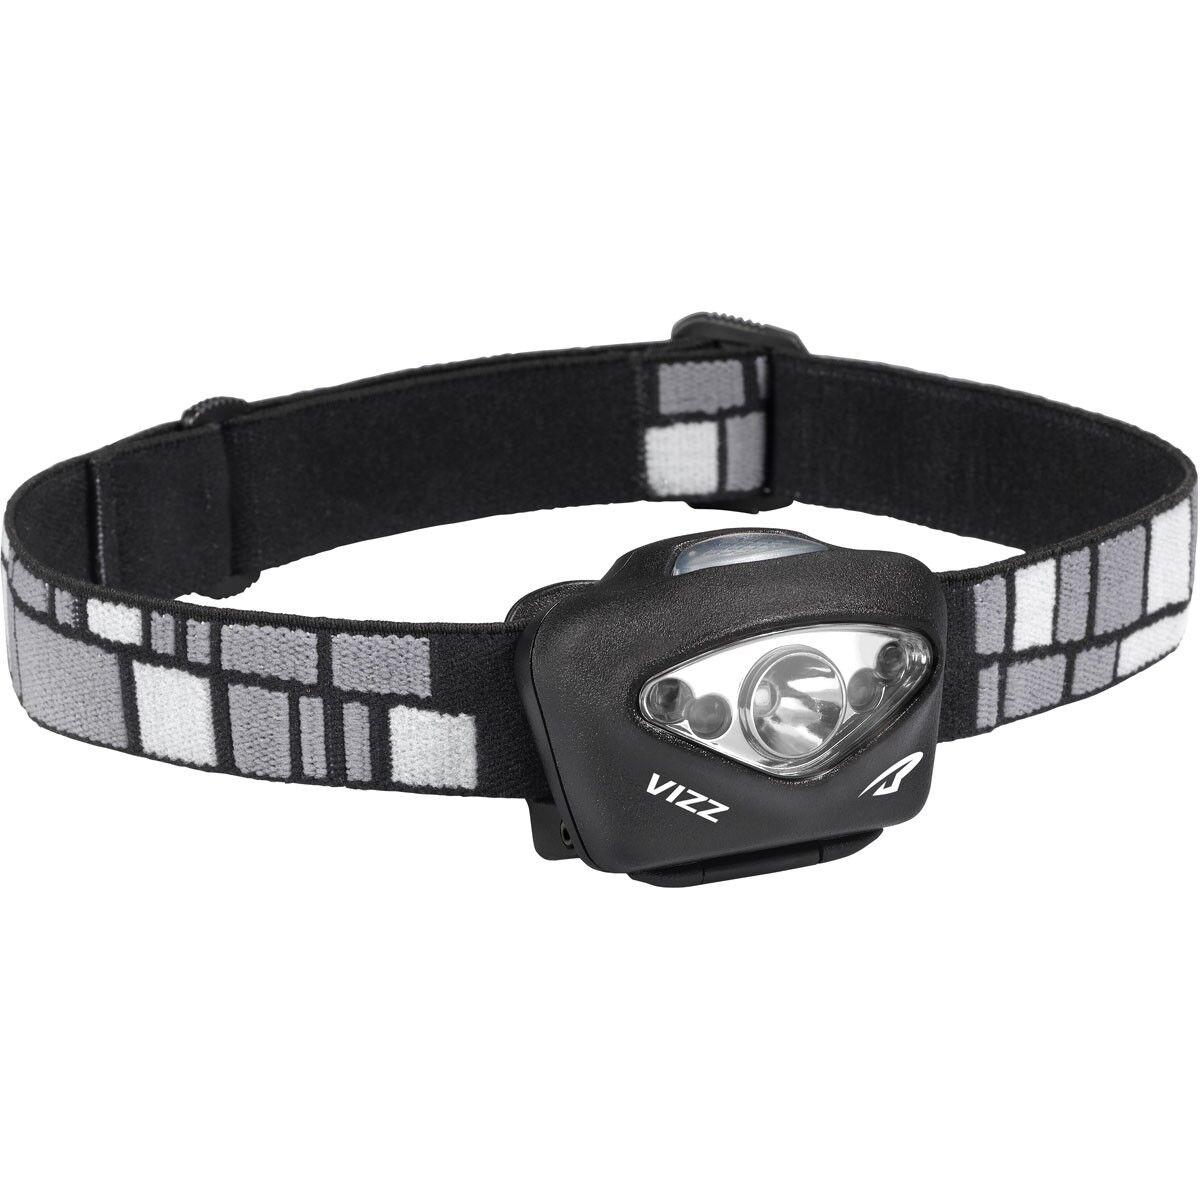 Princeton Tec Vizz 350 LED Headlamp